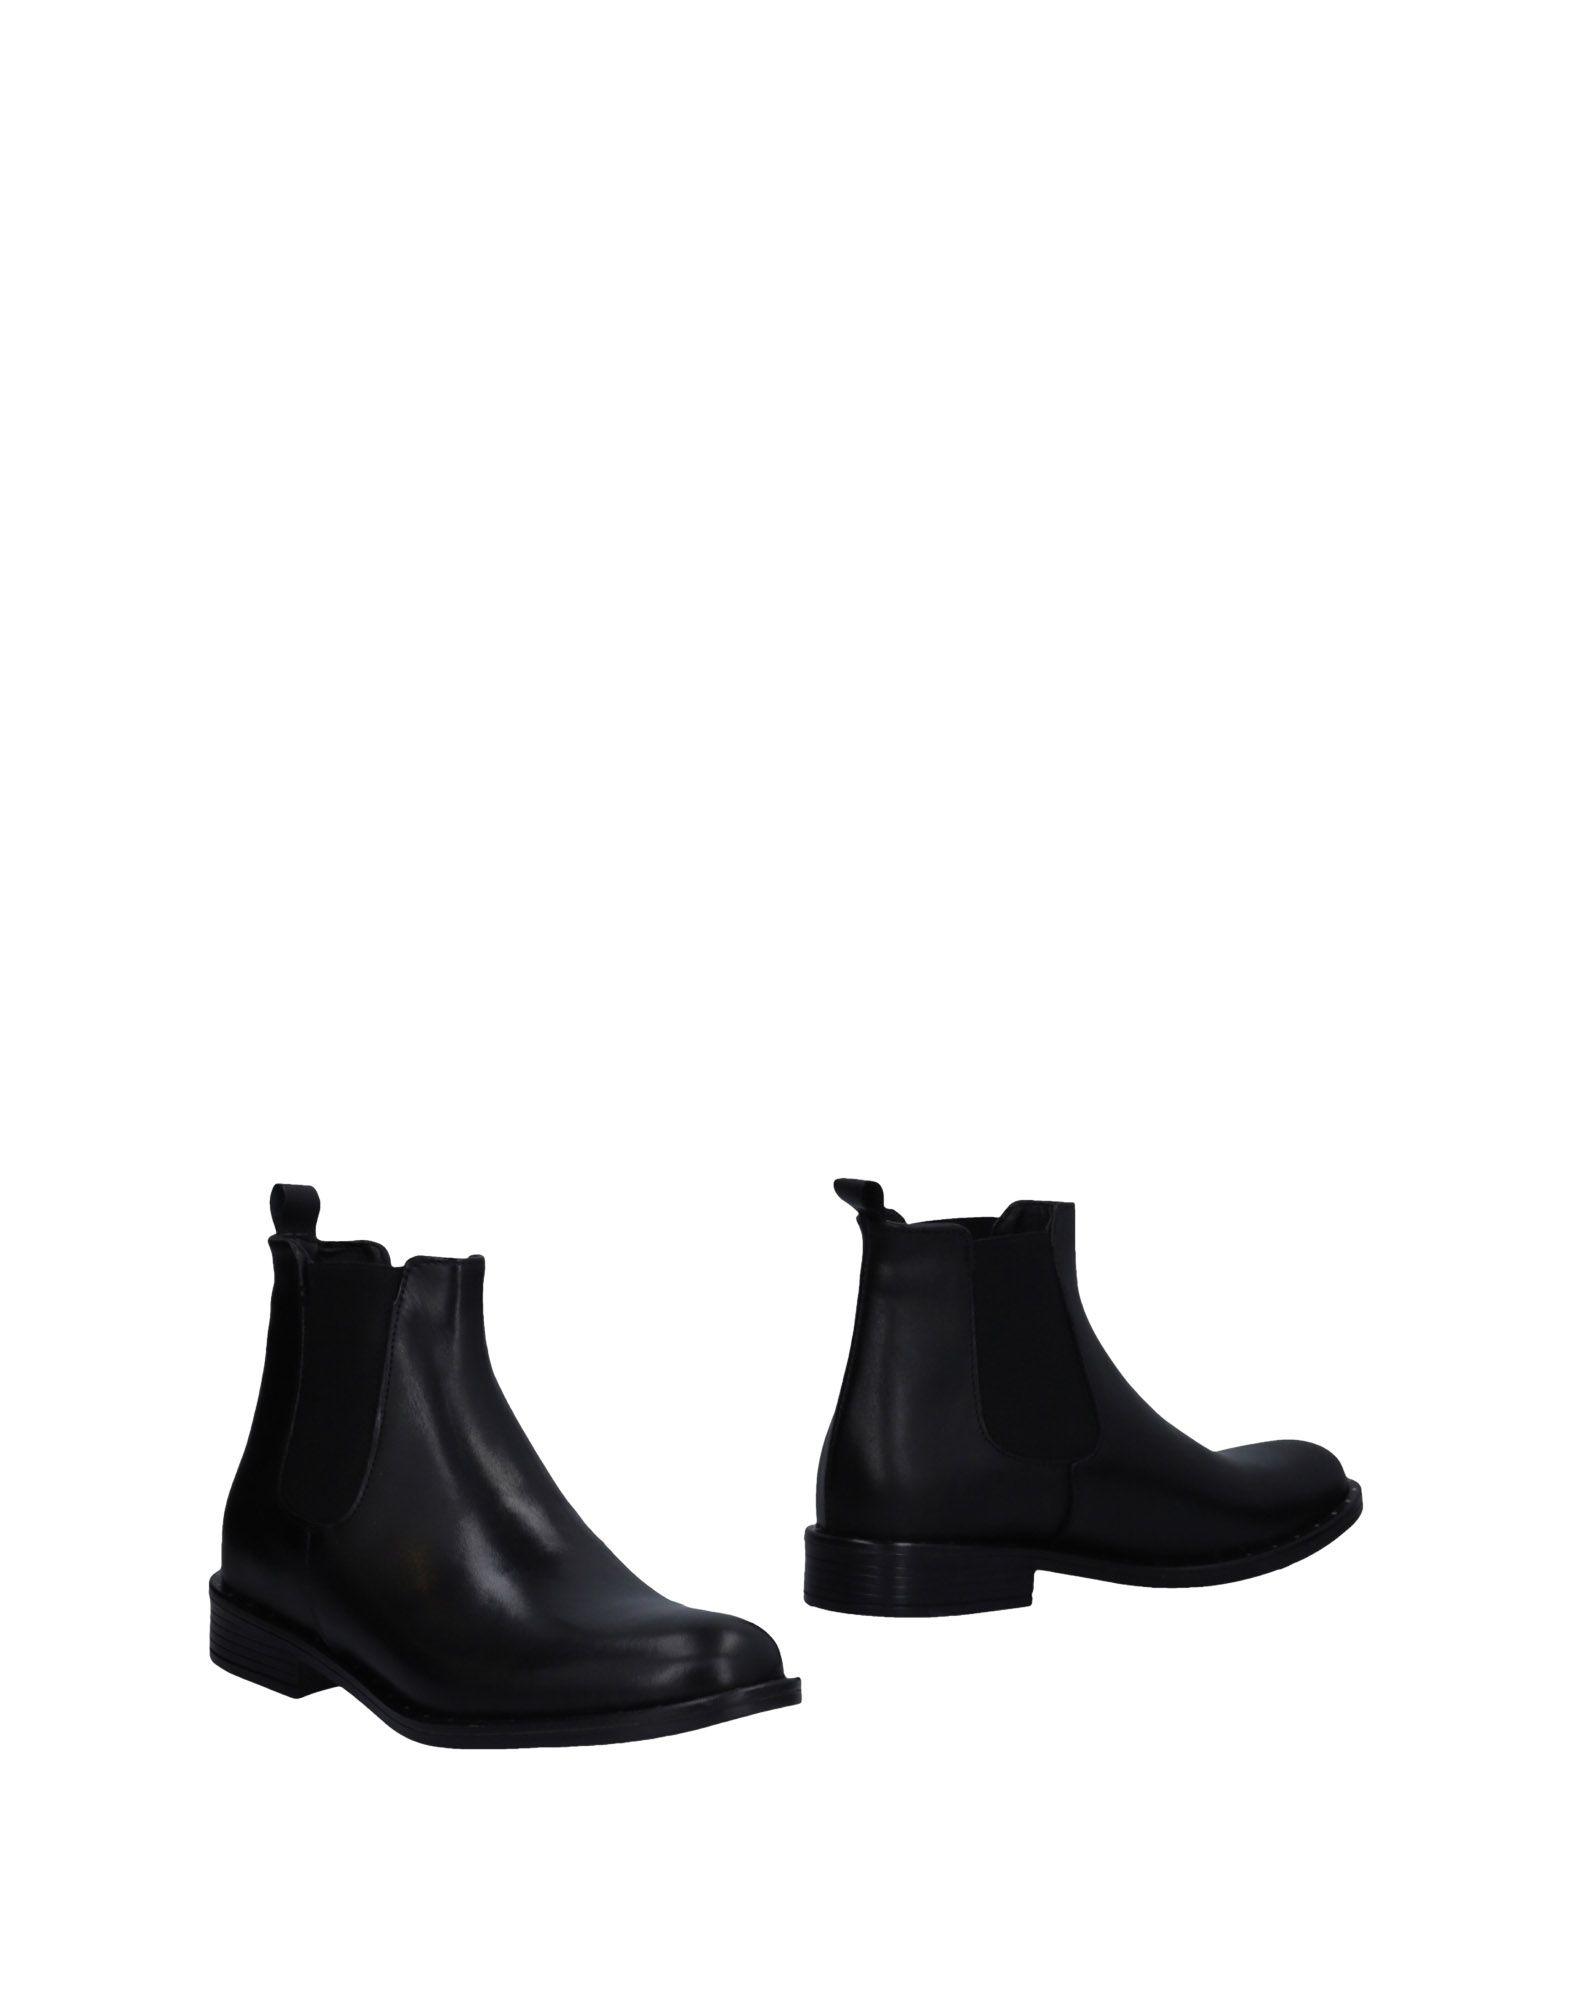 Chelsea Boots Boots Chelsea Unlace Donna - 11472641JU ac18af